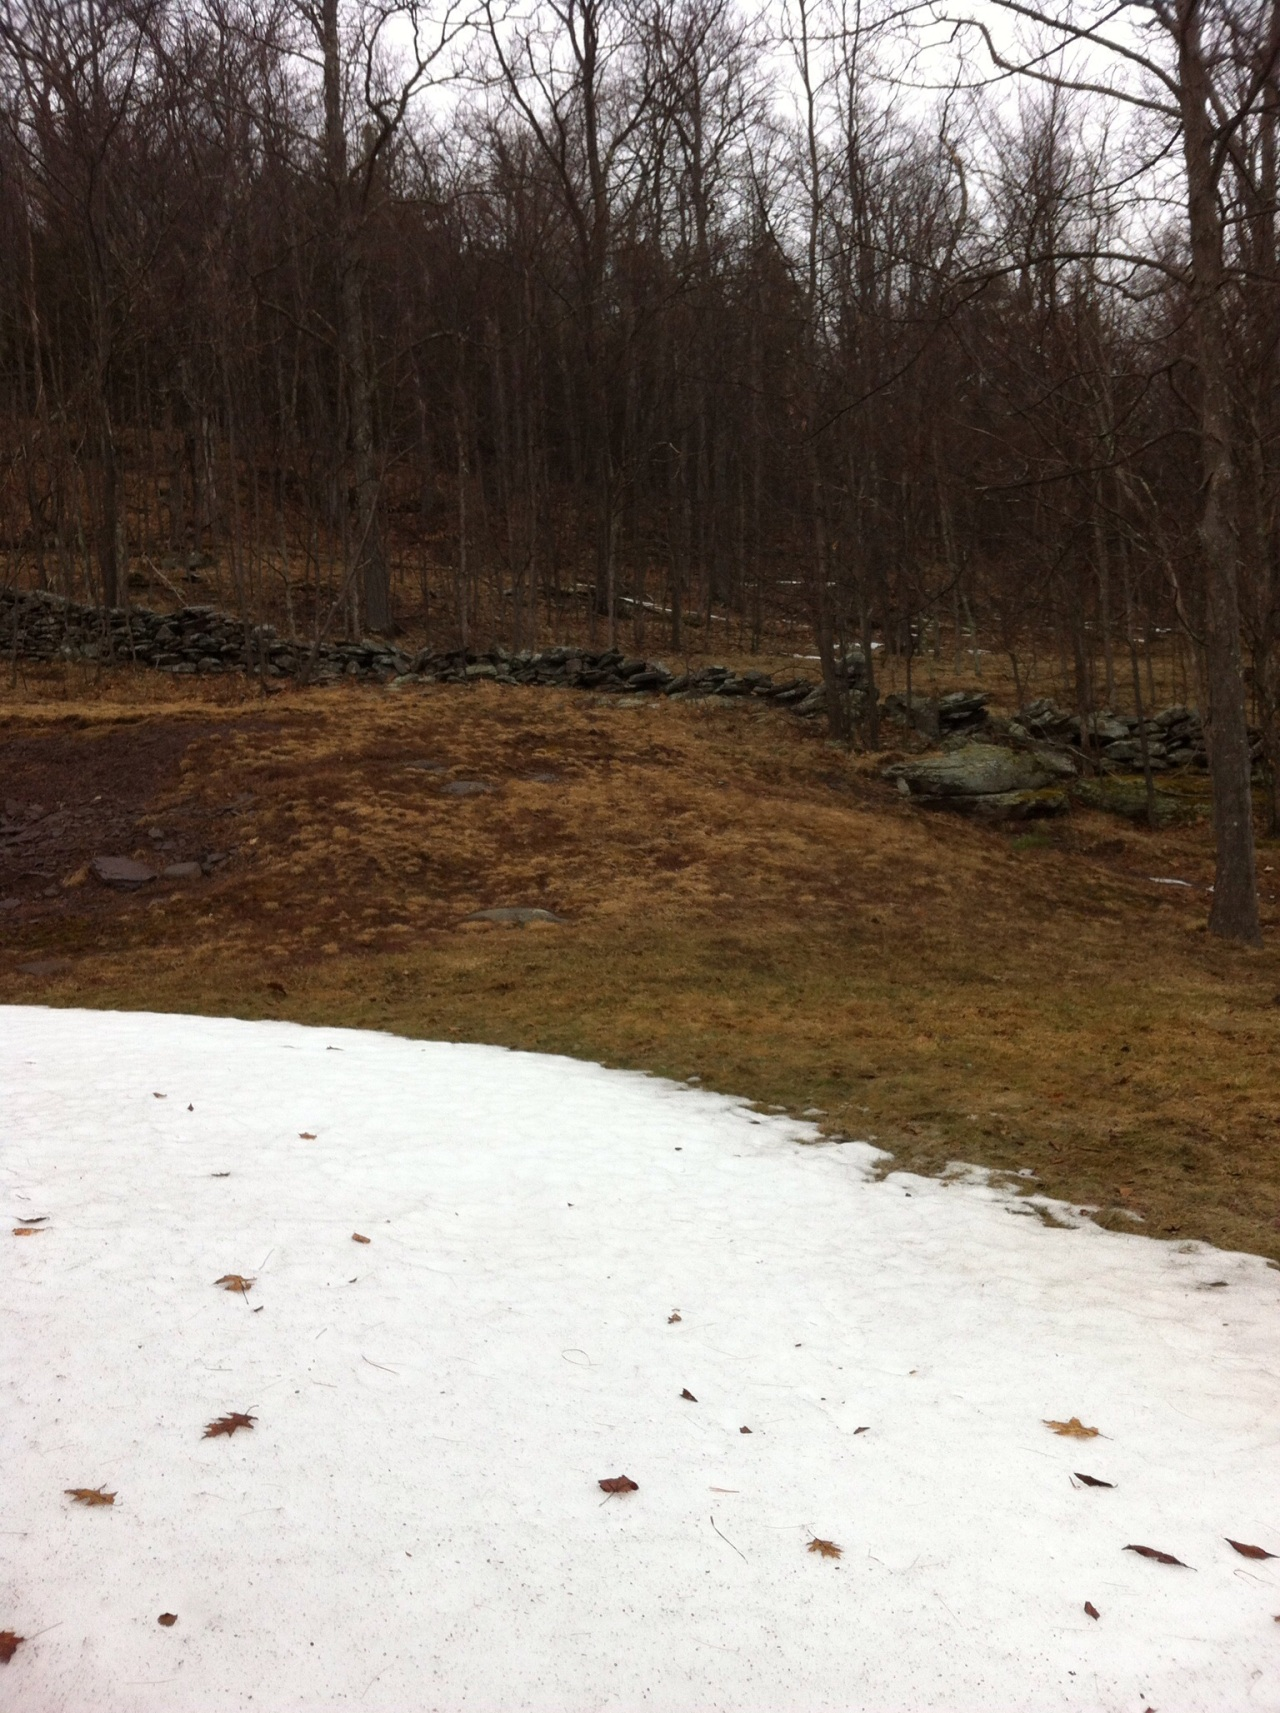 Still some snow piled around. Catskills. [Photo by me, 2015.]